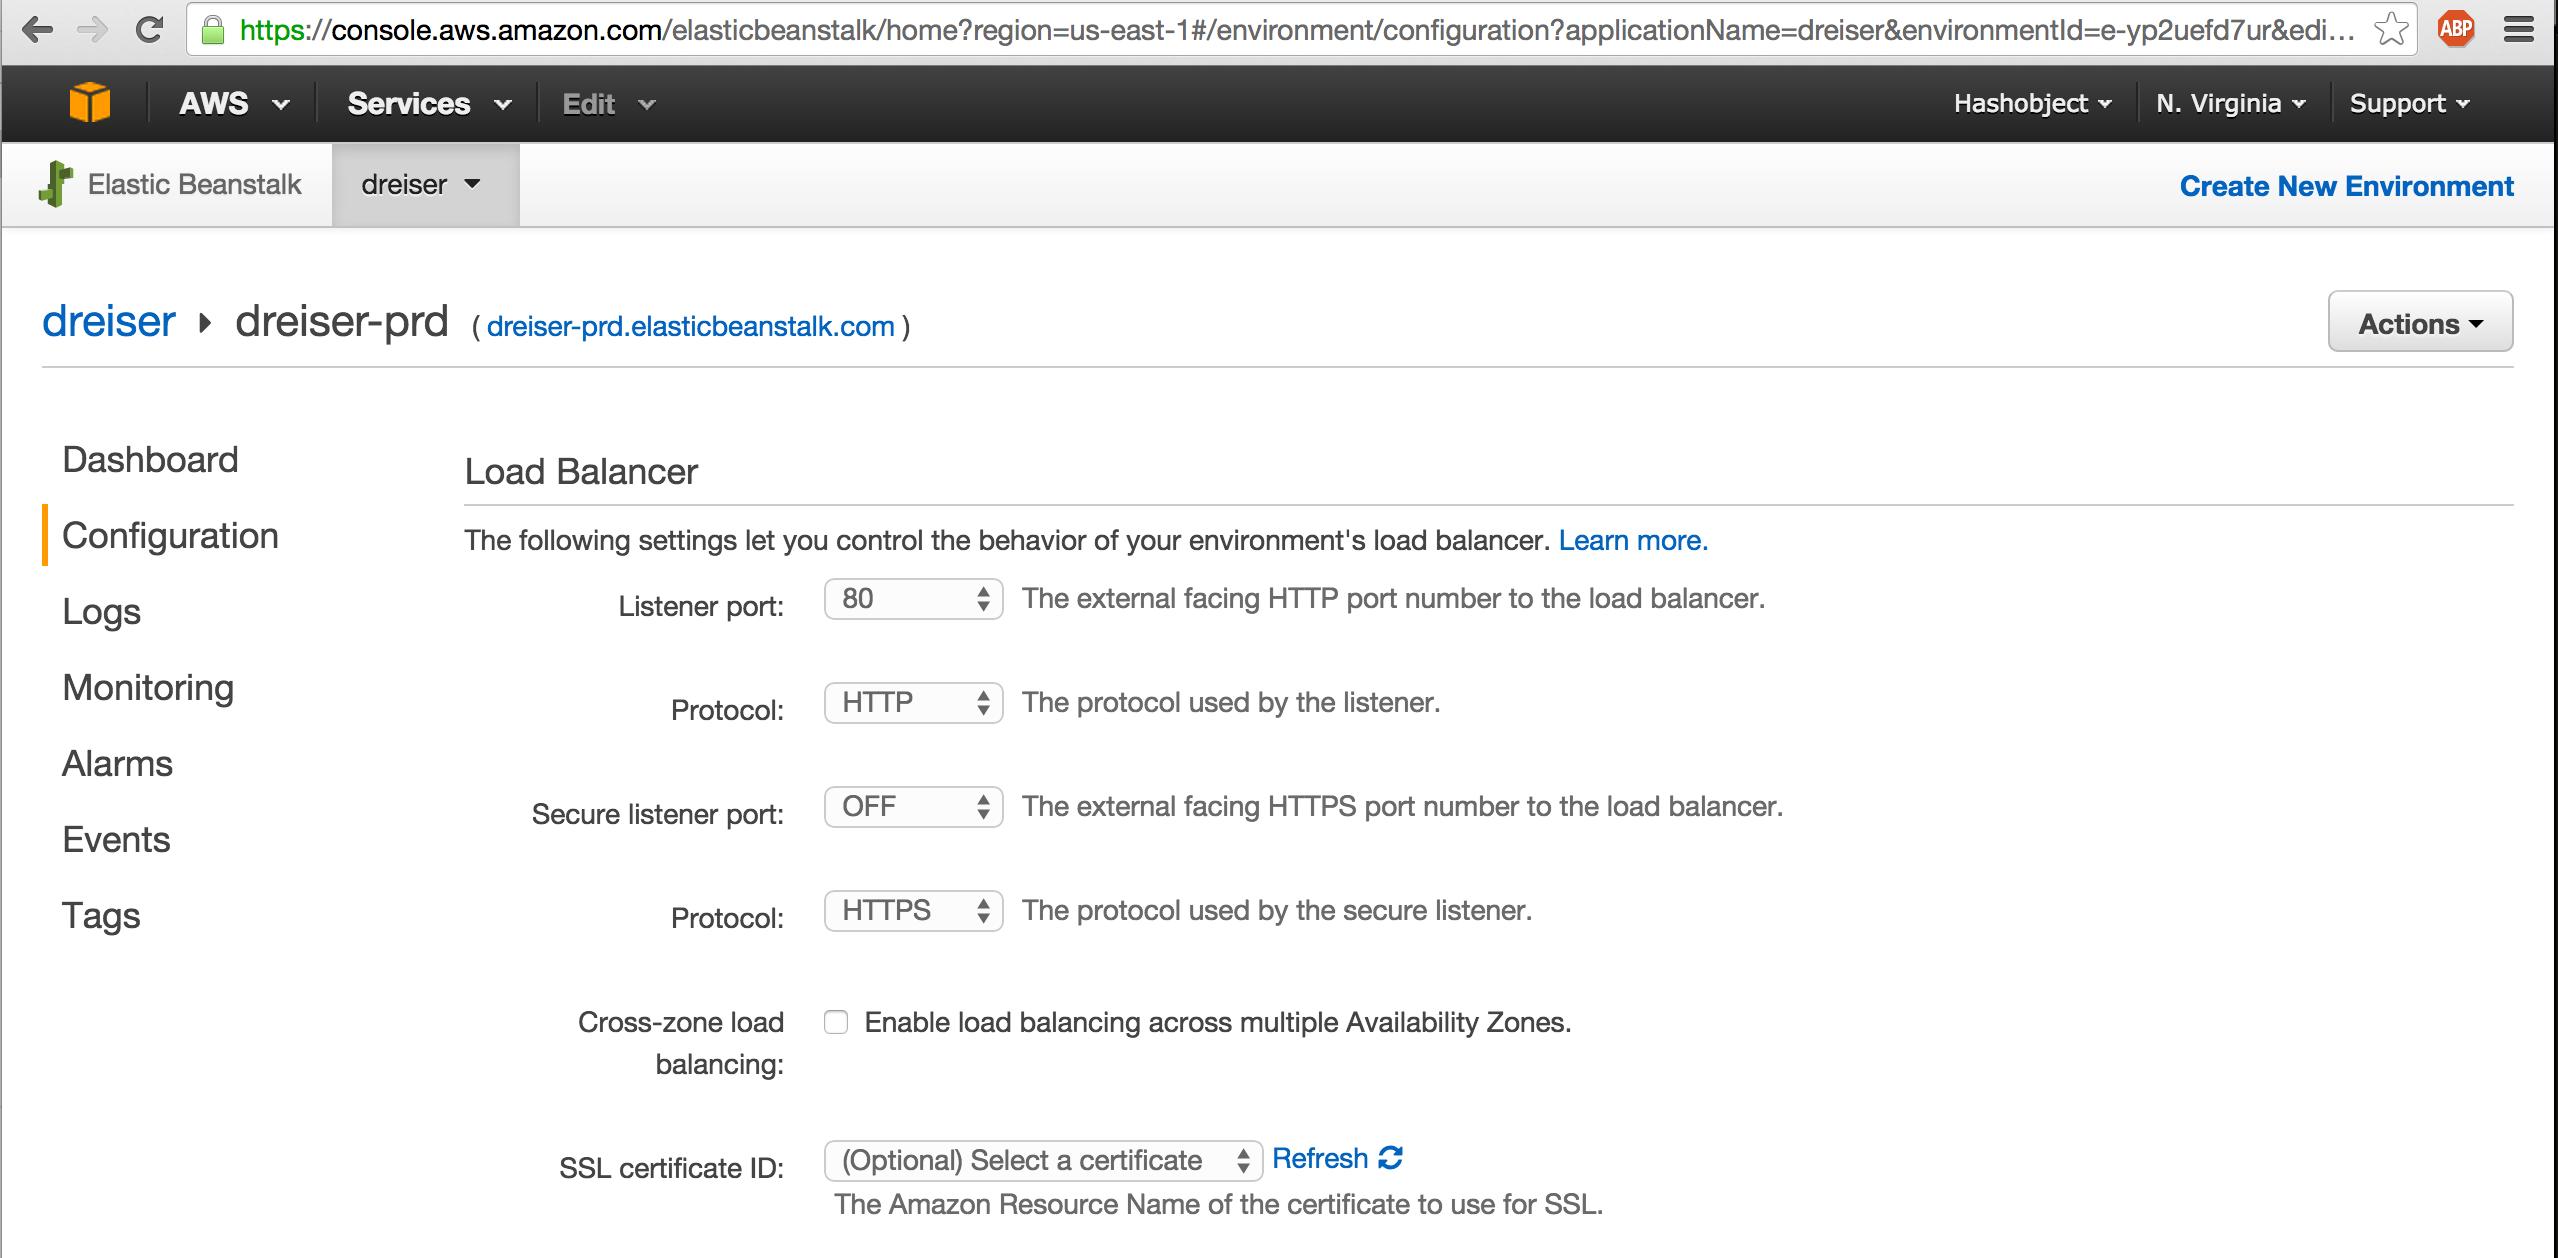 dreiser-prd_-_configuration_and_inbox